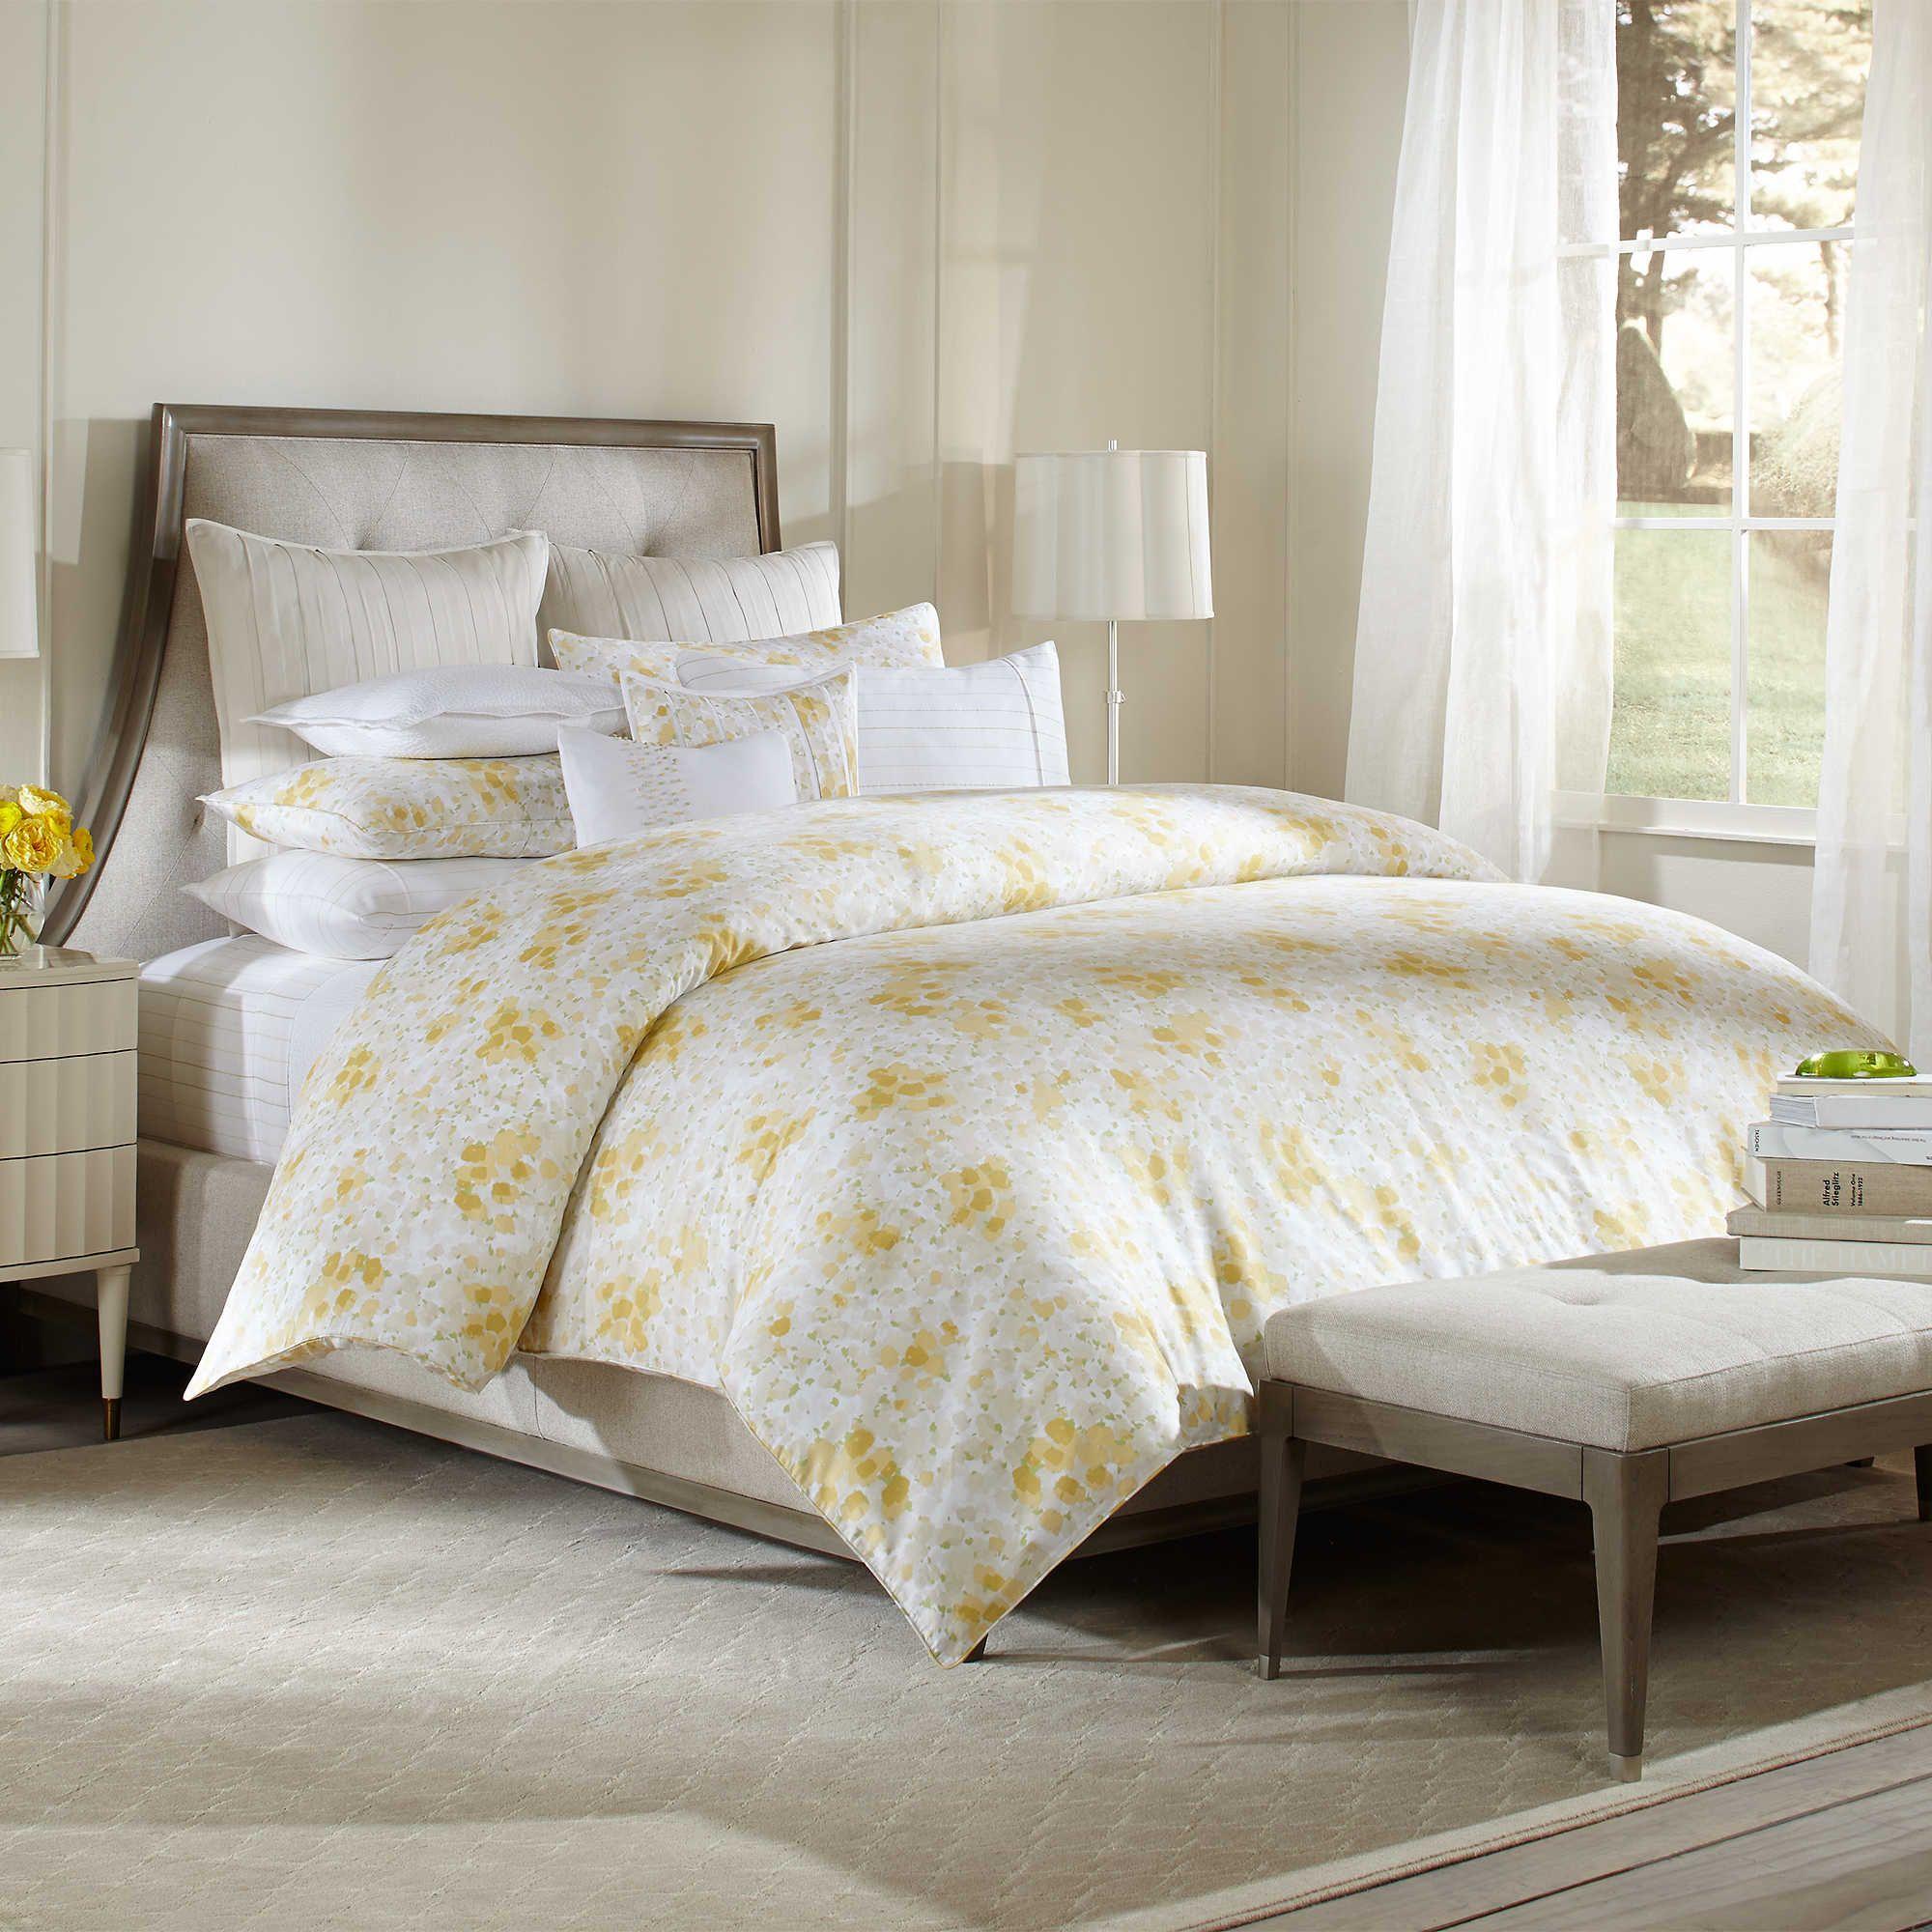 dot and yellow pin polka grey cover duvet cases bedding set pillow